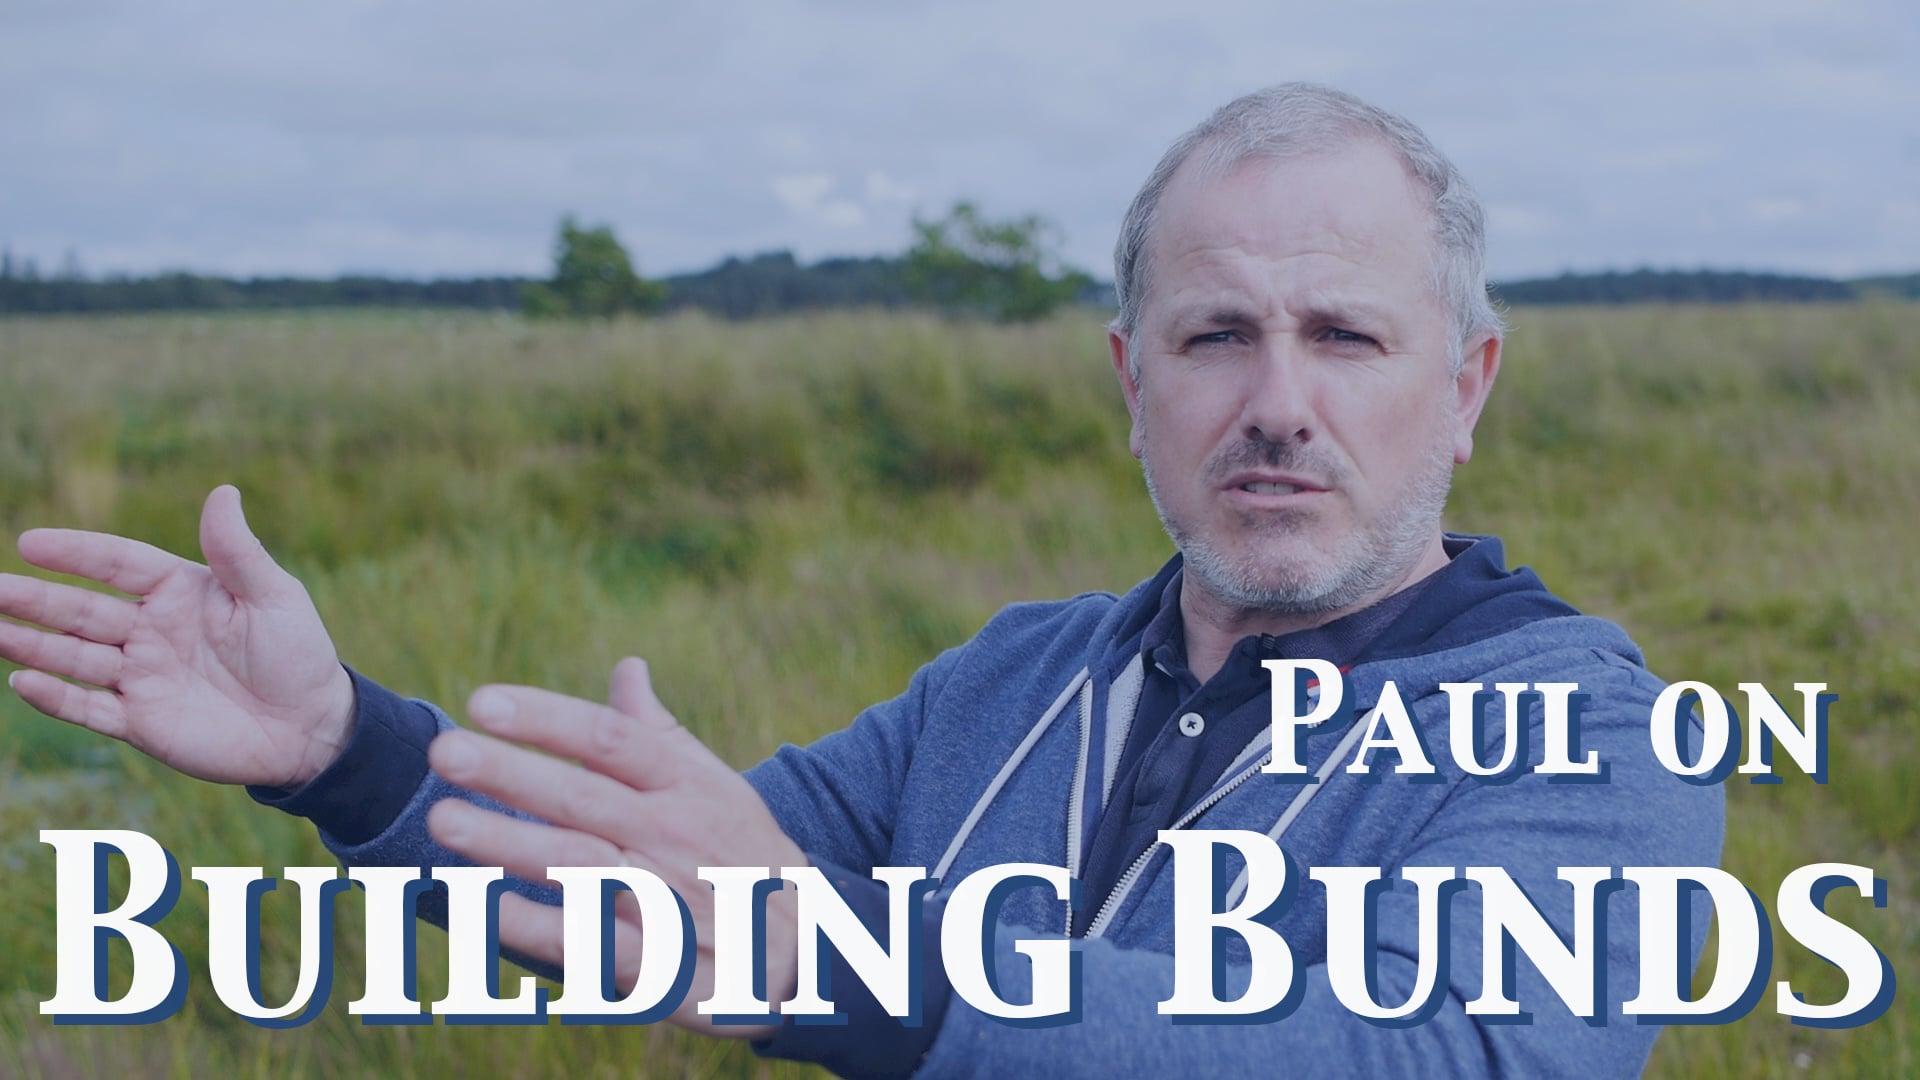 Paul on building bunds